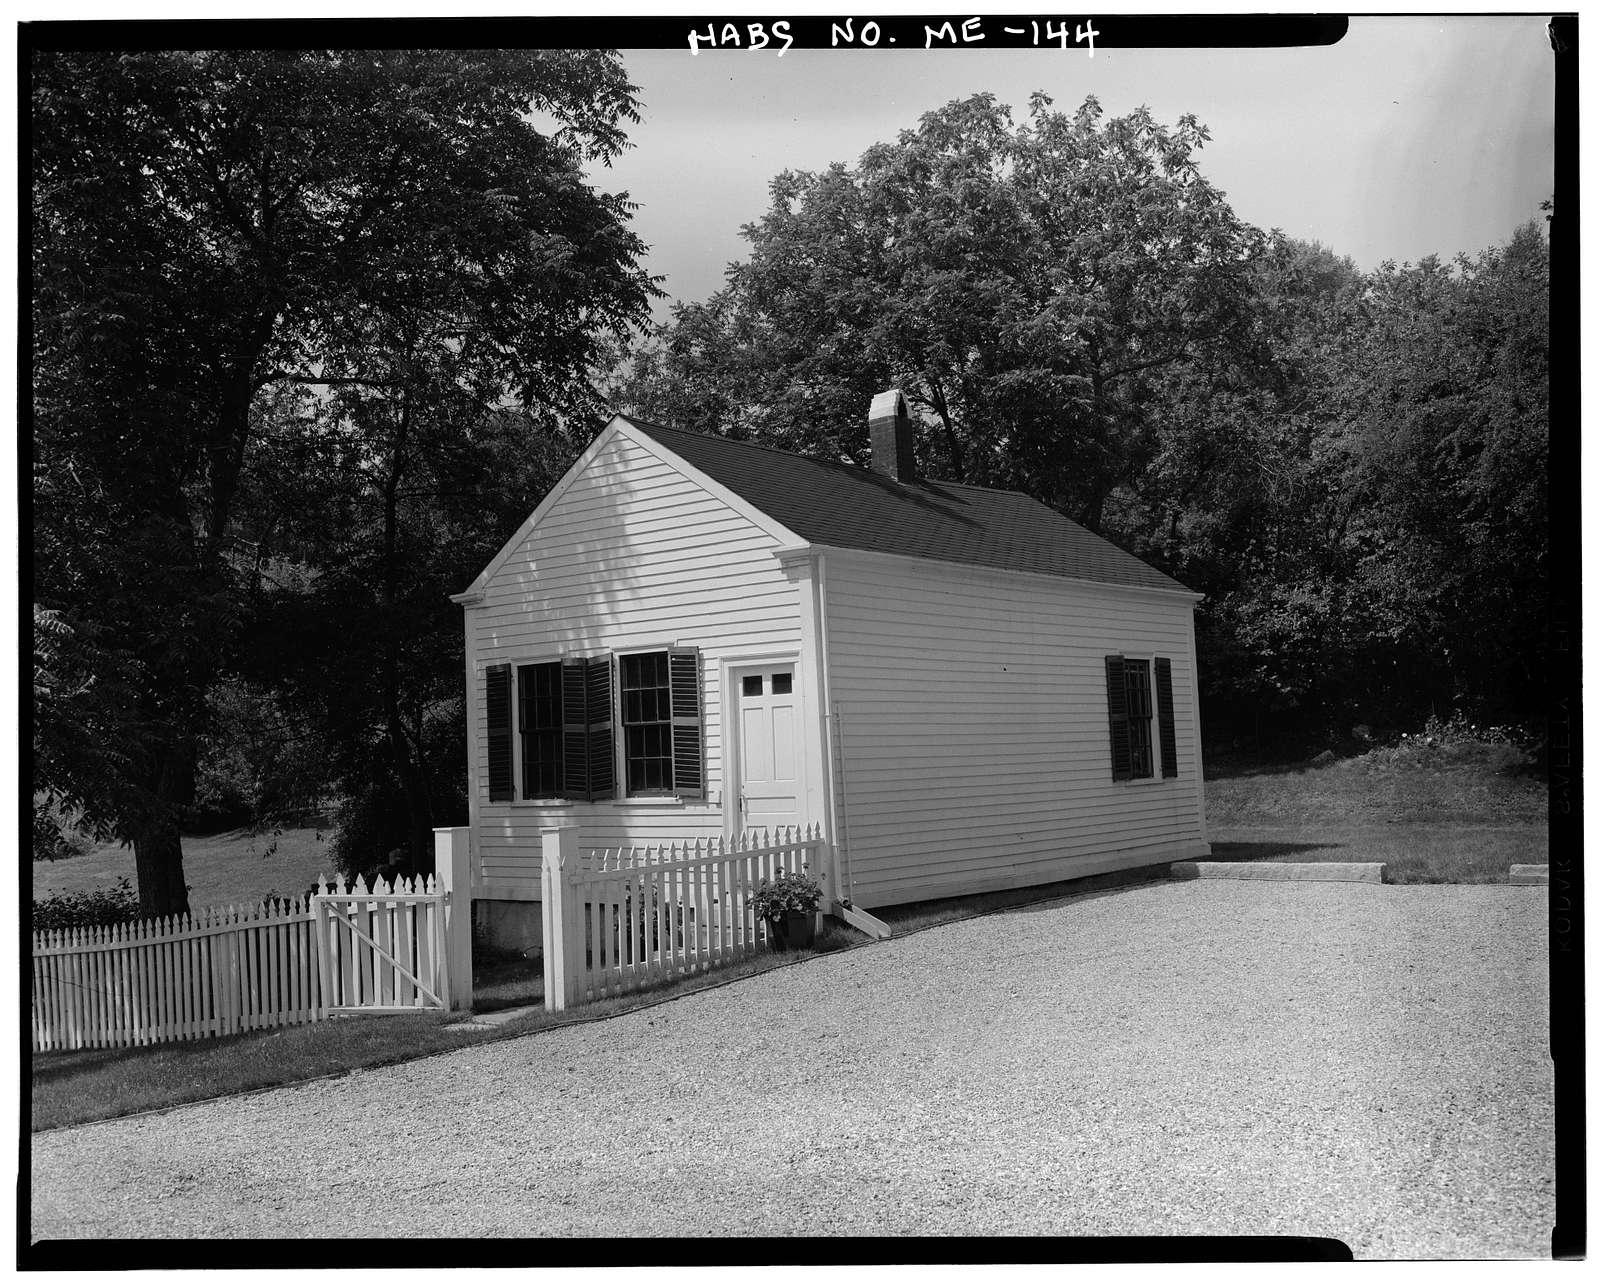 Governor John Hubbard House, 52 Winthrop Street, Hallowell, Kennebec County, ME